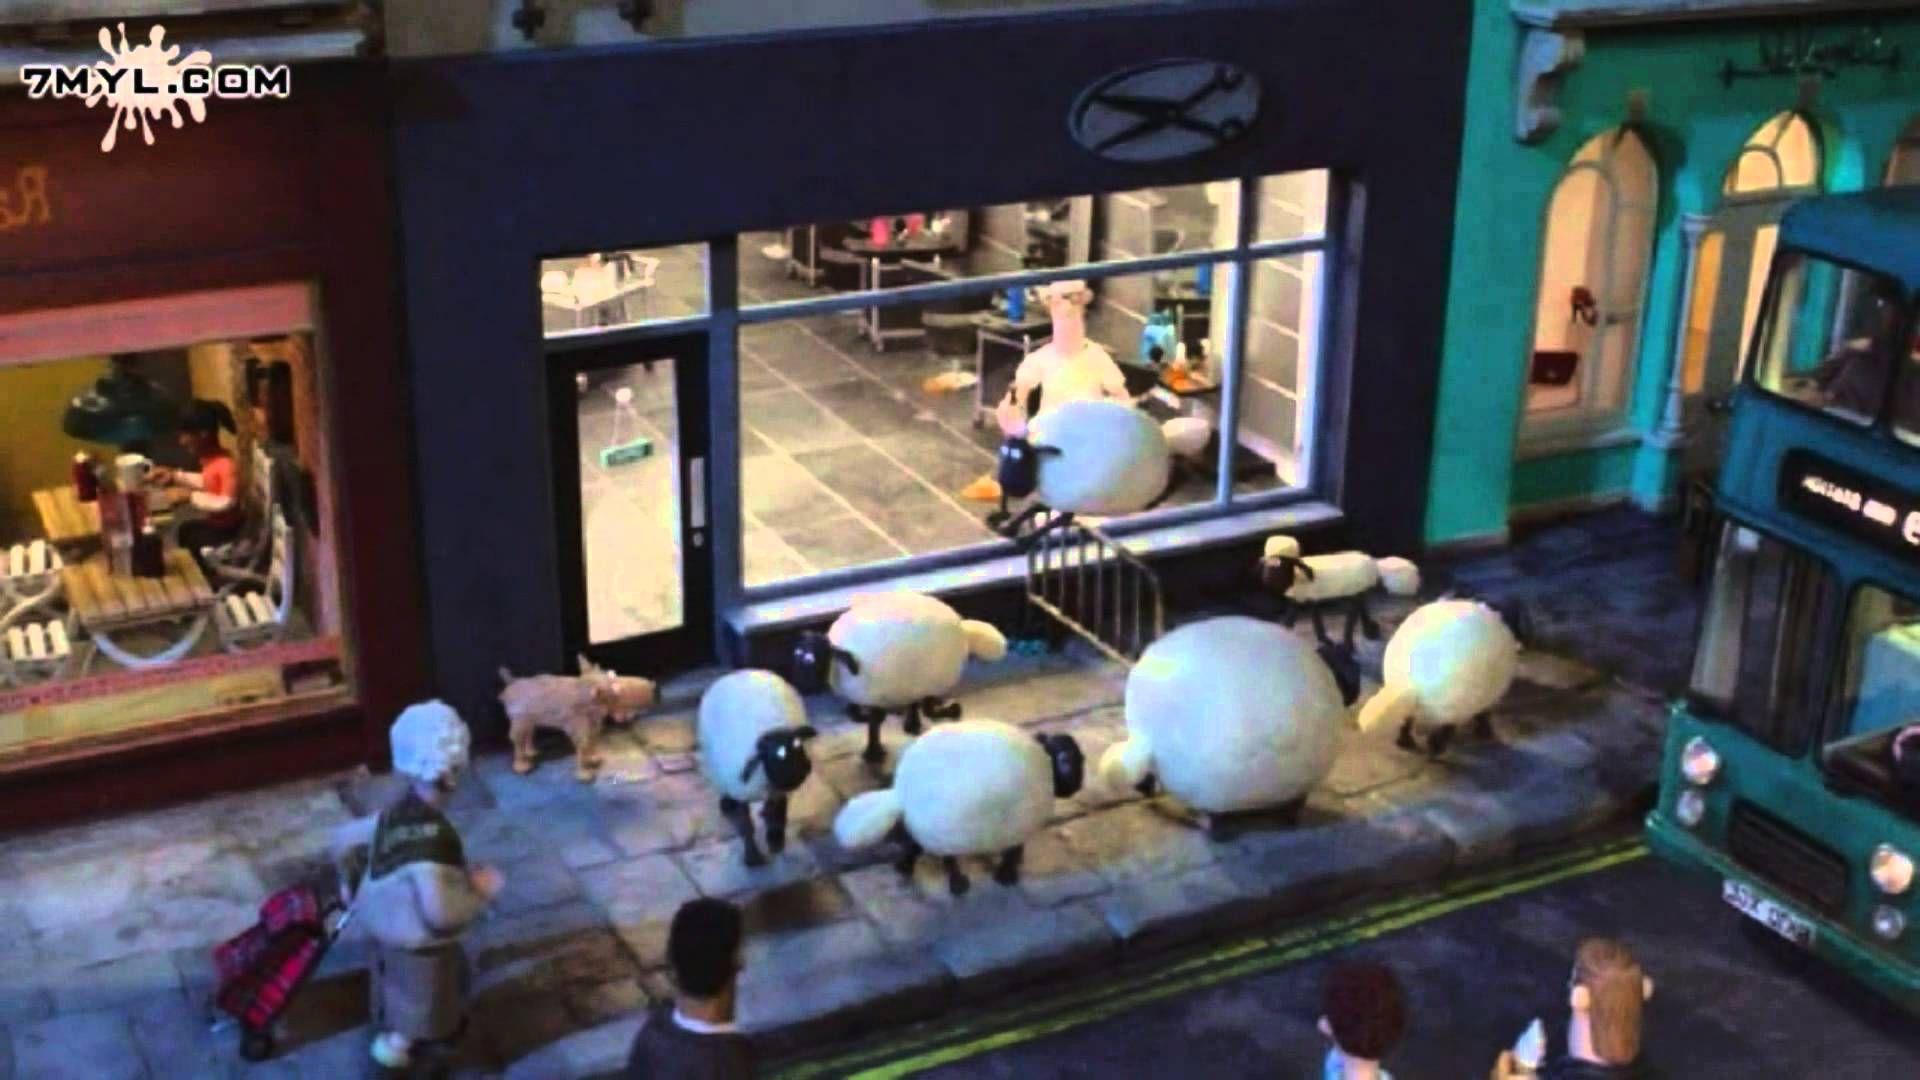 قصة فيلم كرتون الخروف شون ذا شيب Shaun The Sheep 2015 عربي كامل Cartoons Youtube Cartoons Full Movie Cartoon